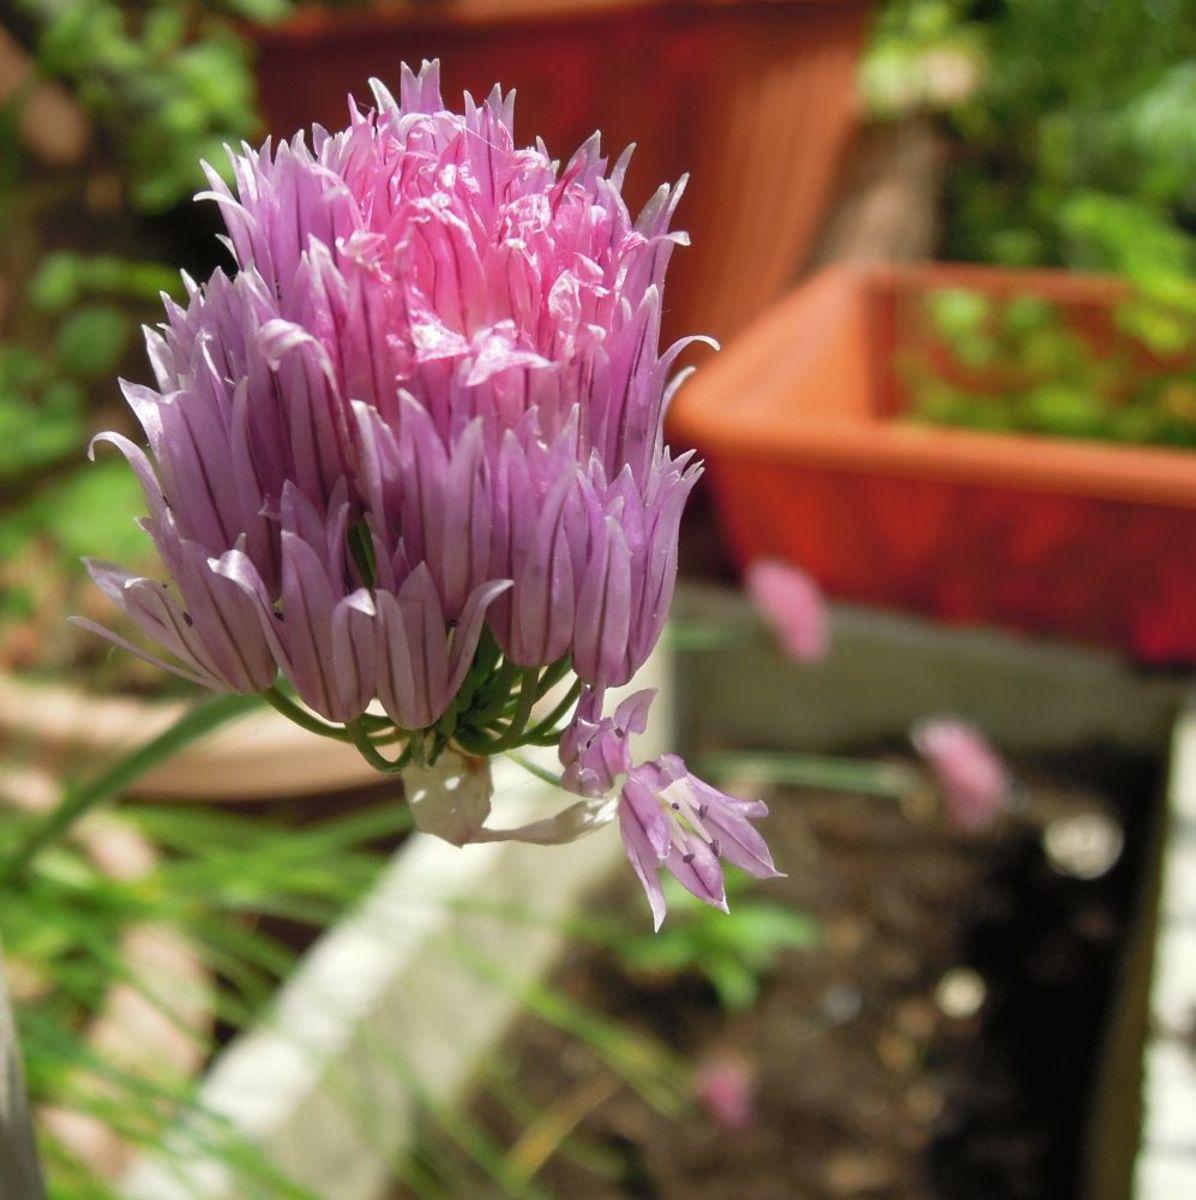 Many everyday herbs hav eexcellent magical properties.